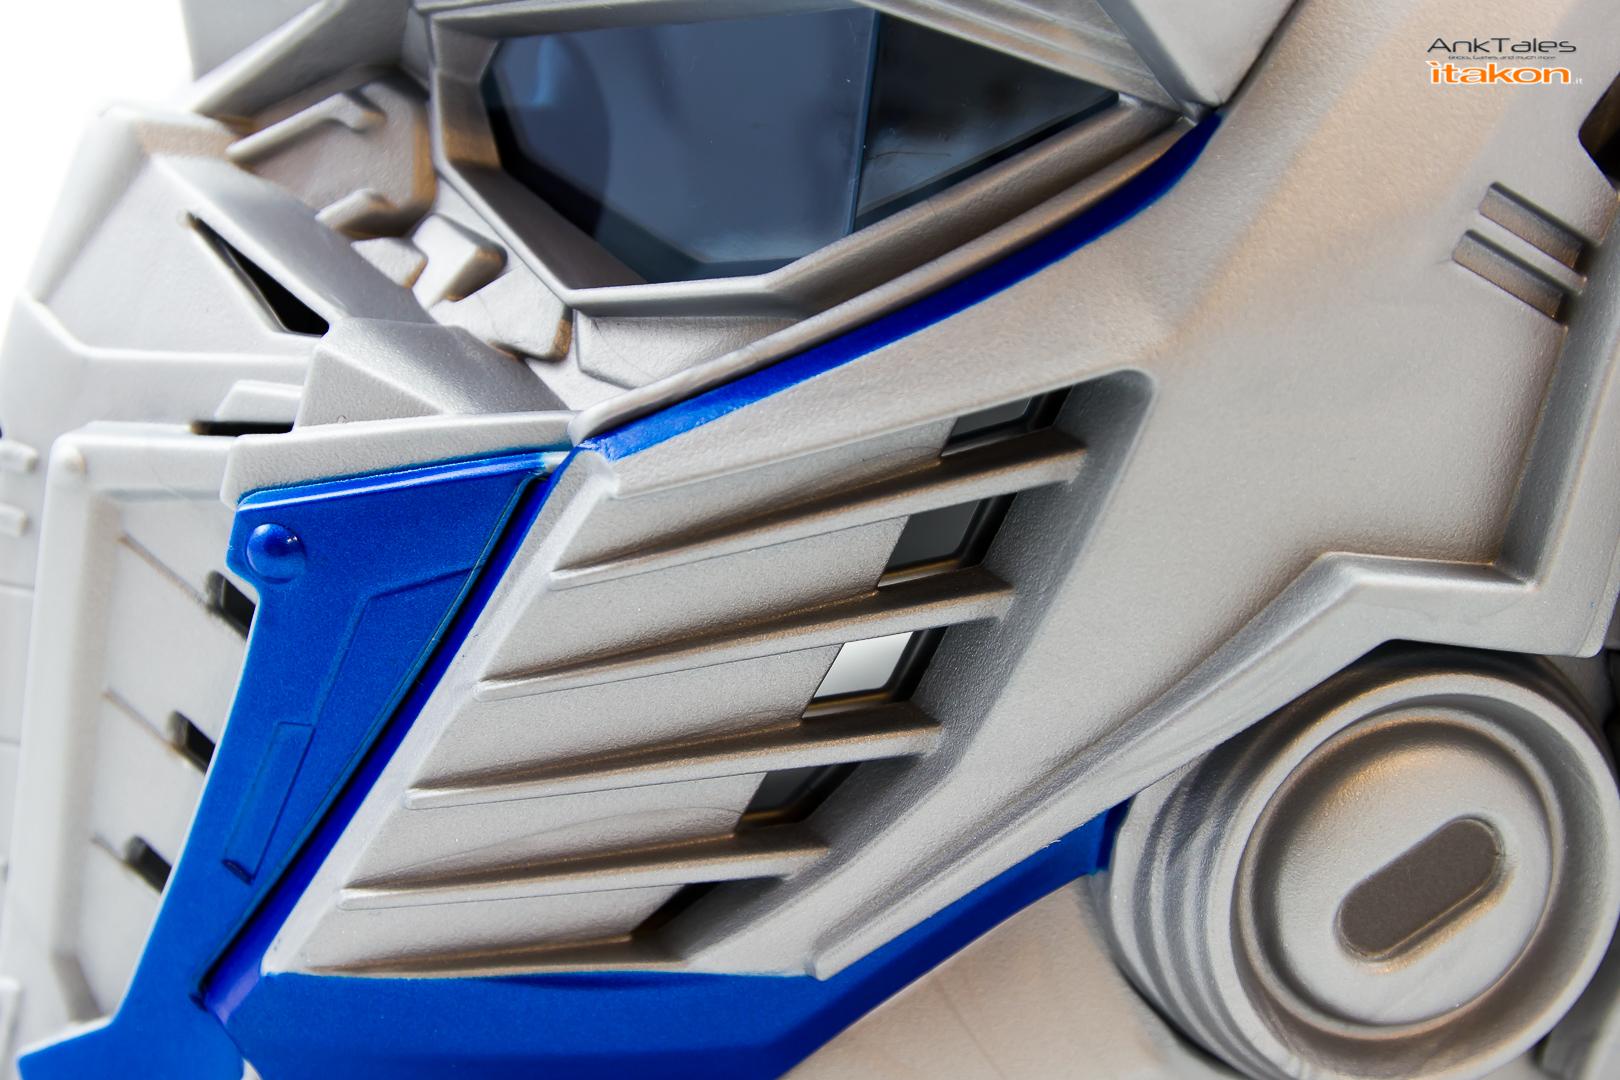 Link a Hasbro Optimus Prime helmet Anktales Itakon_0034